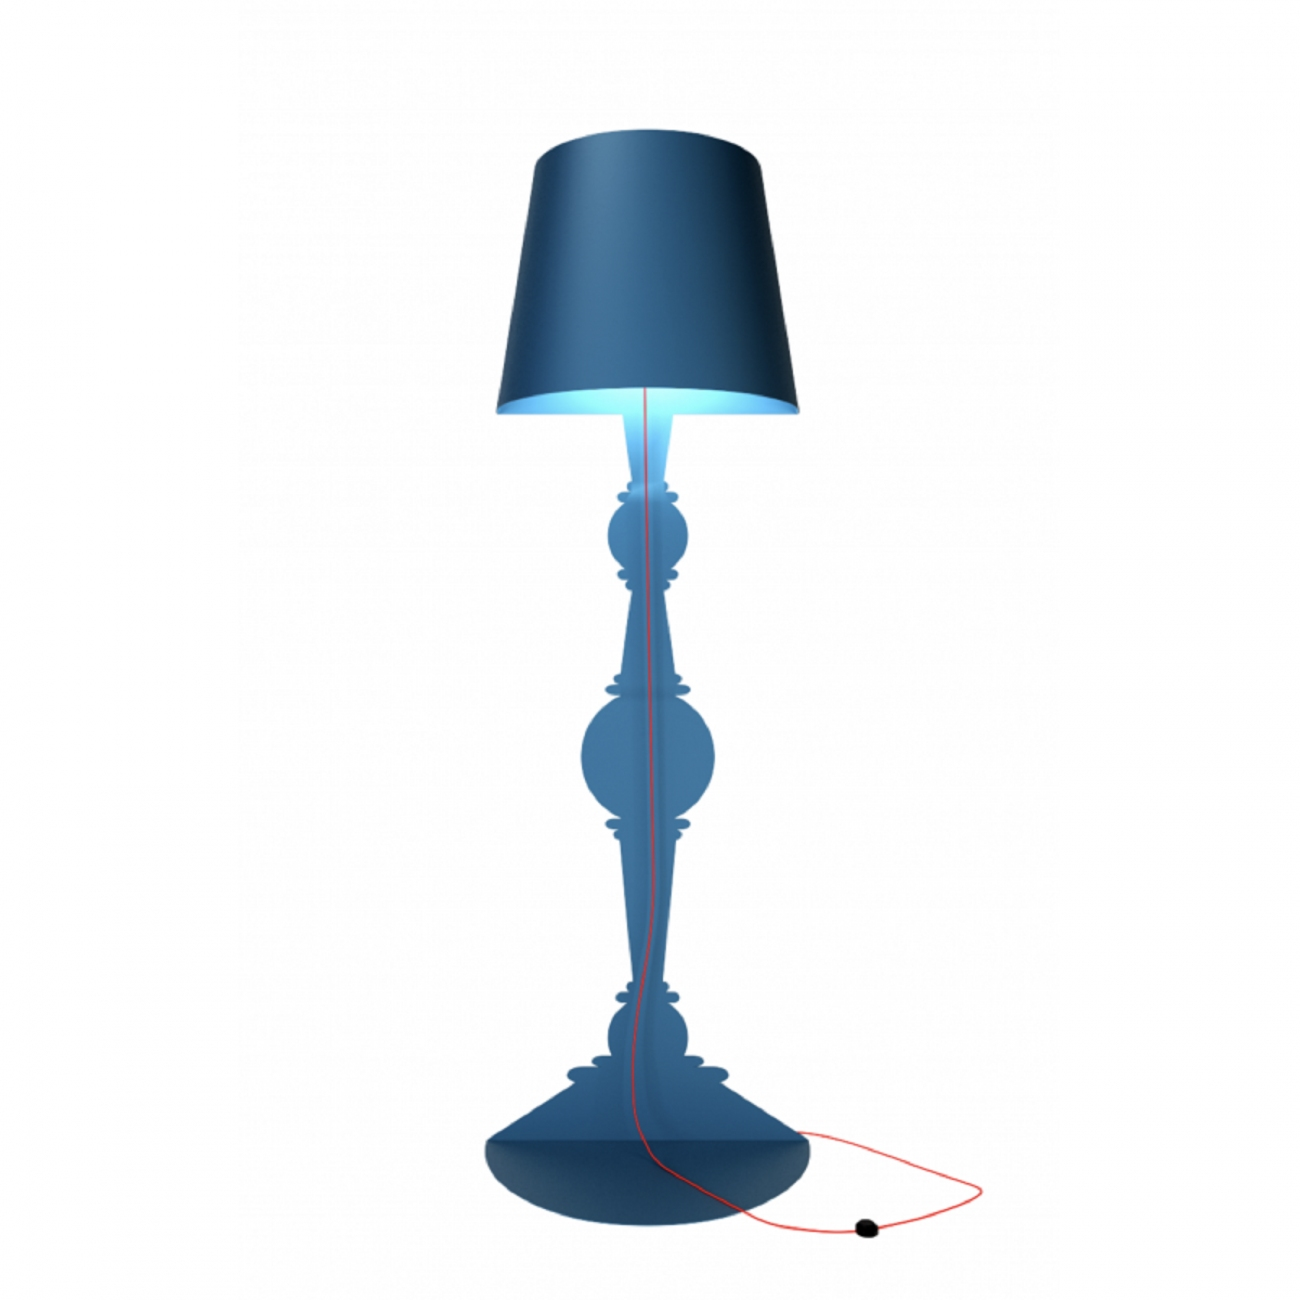 Youmeand Demi 180 Floor Lamp